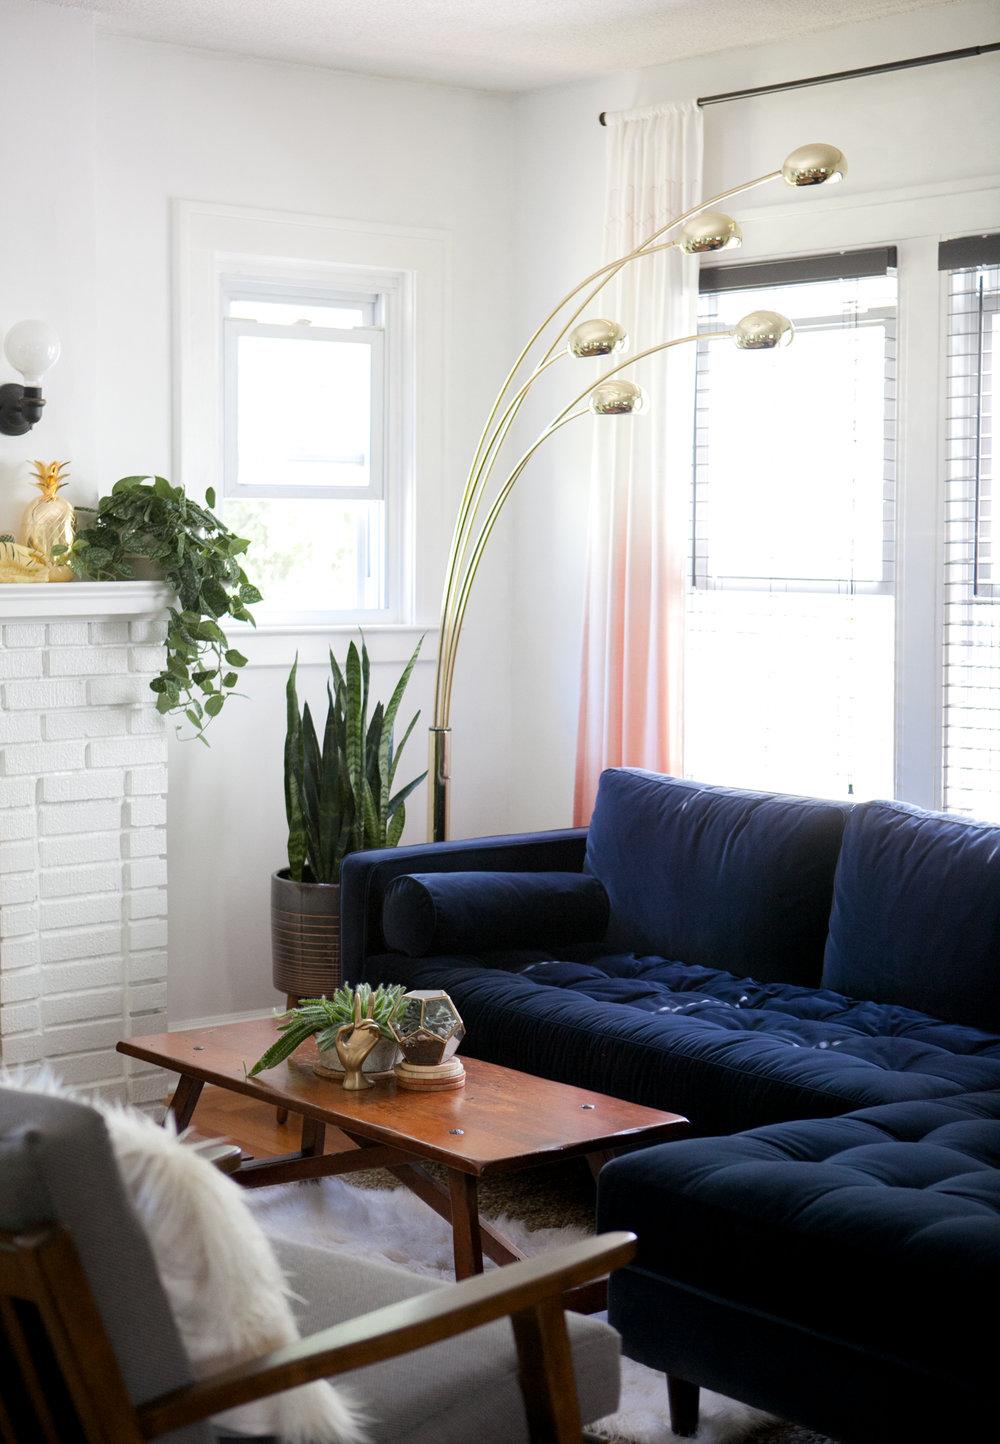 03_Design-Sponge-Jessica-Brigham-Living-Room.jpg